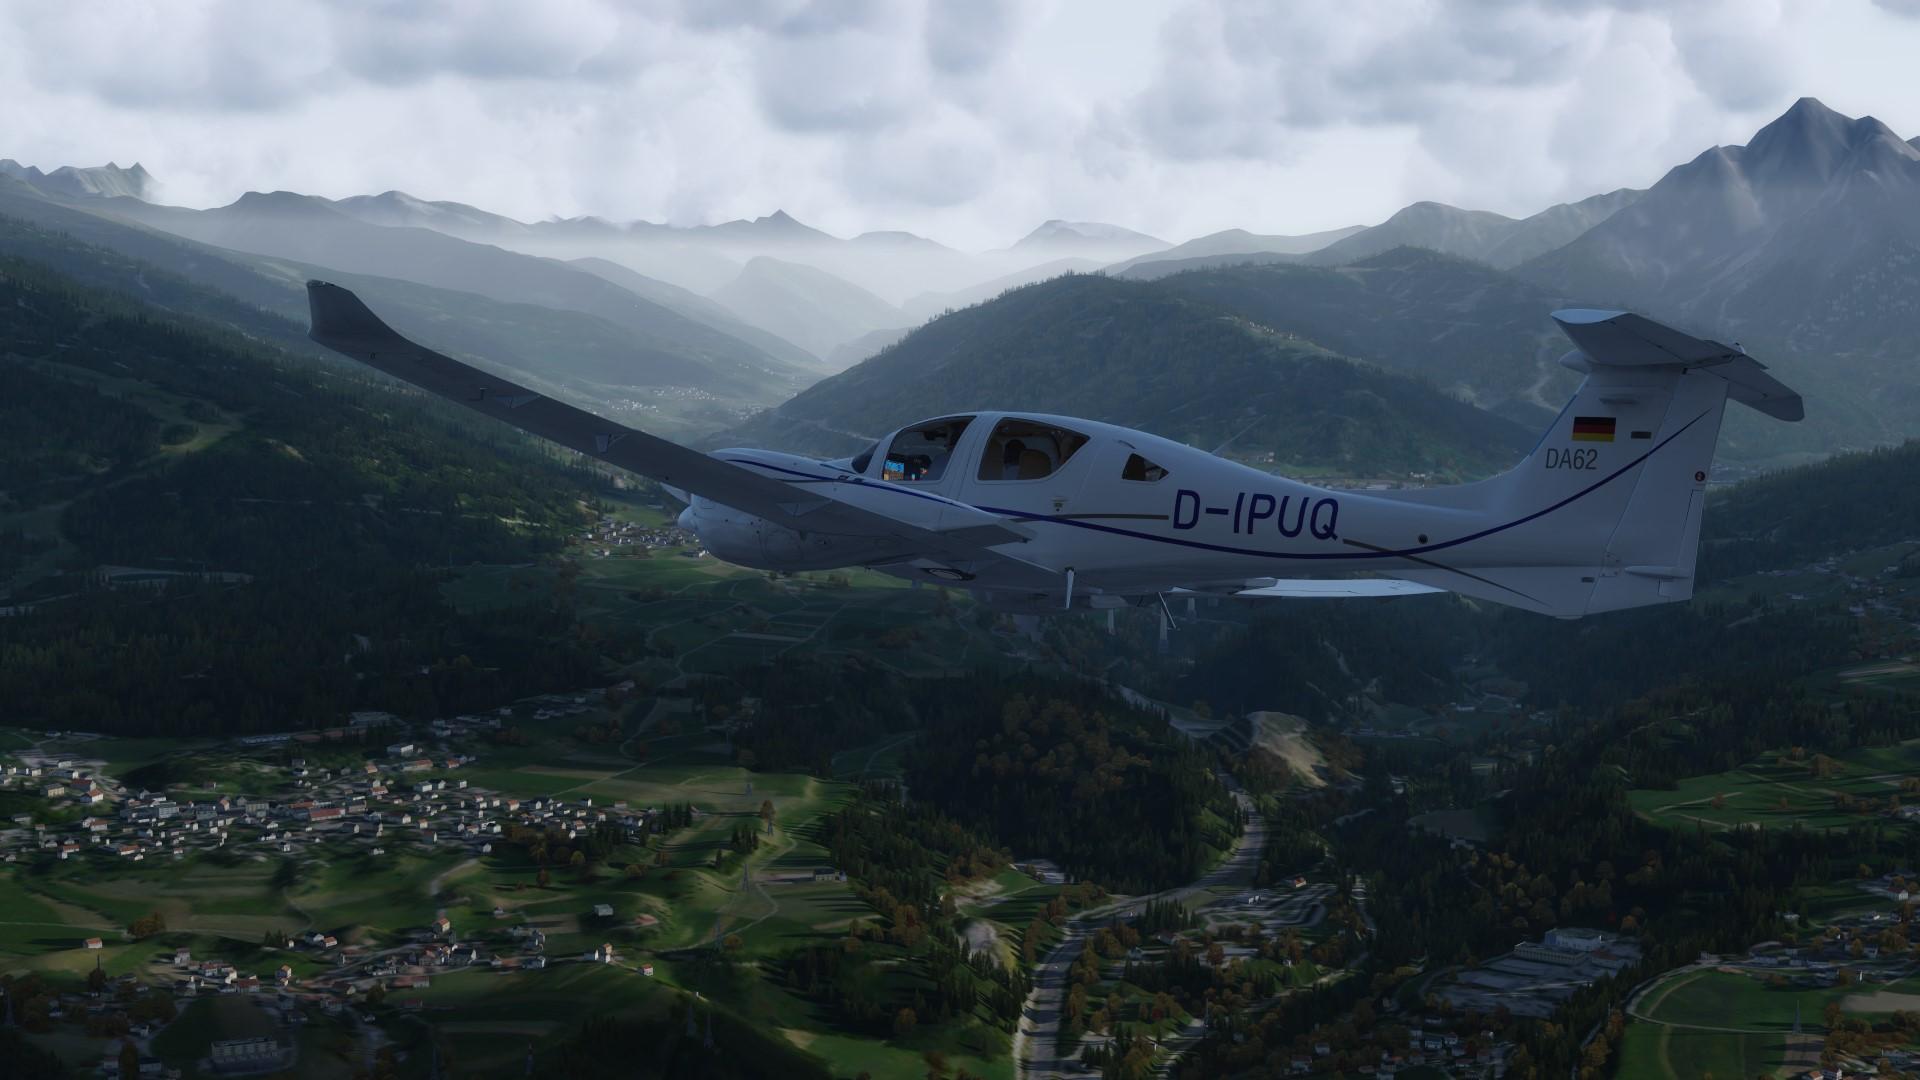 Carenado DA62 - Flugzeuge - VFR-Flightsimmer - Flusi info